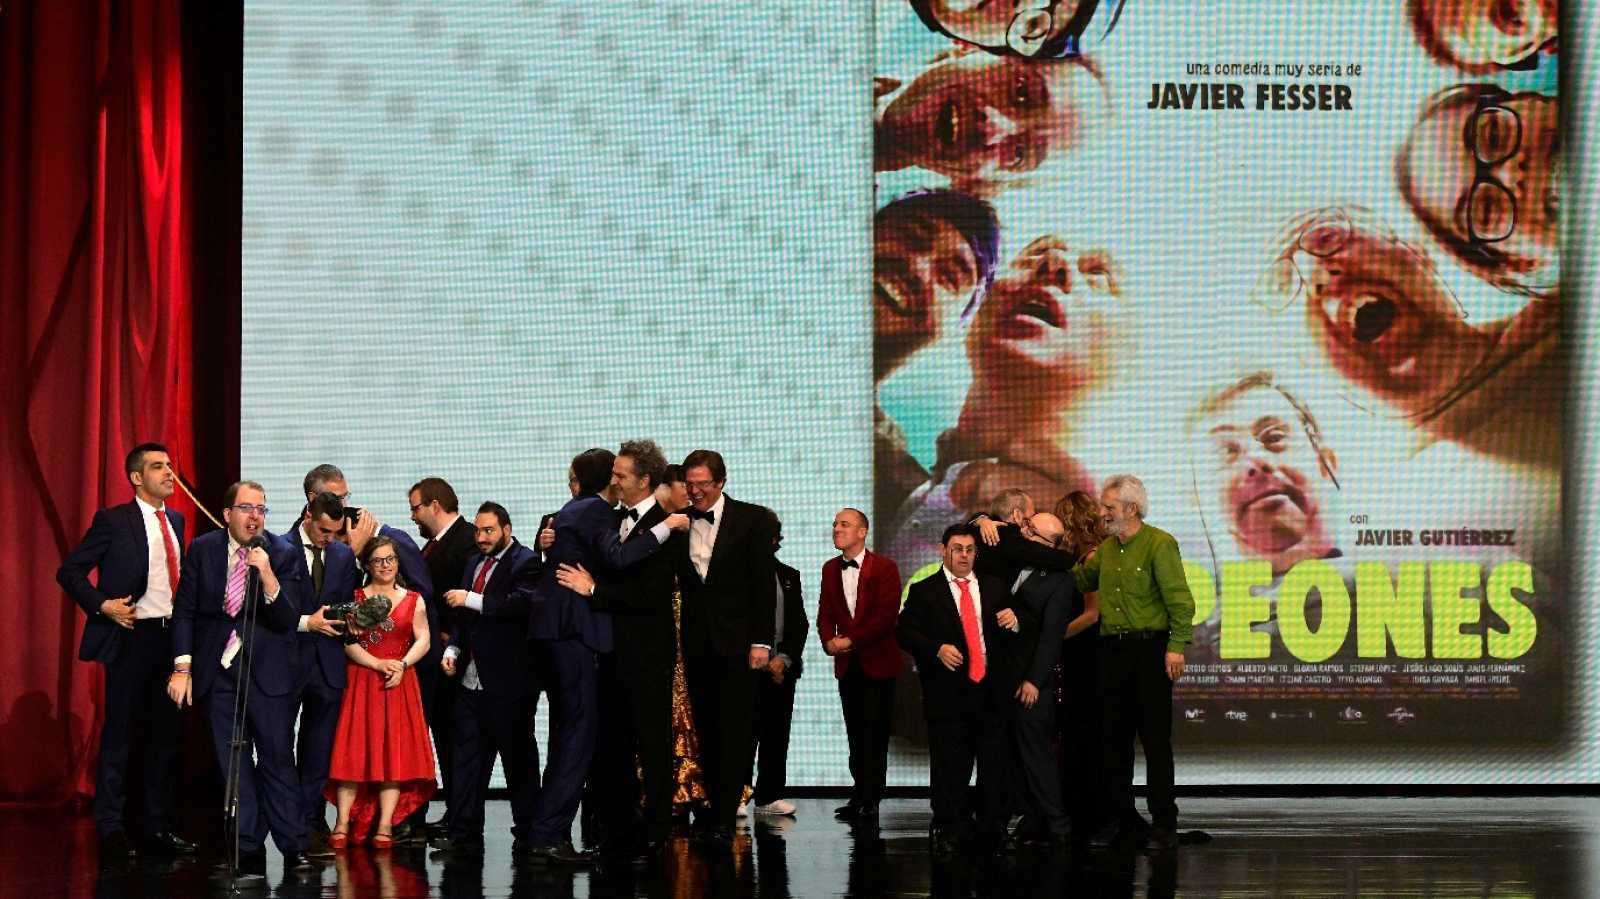 El 'factor Campeones': cinema, premis, reivindicacions i mancances